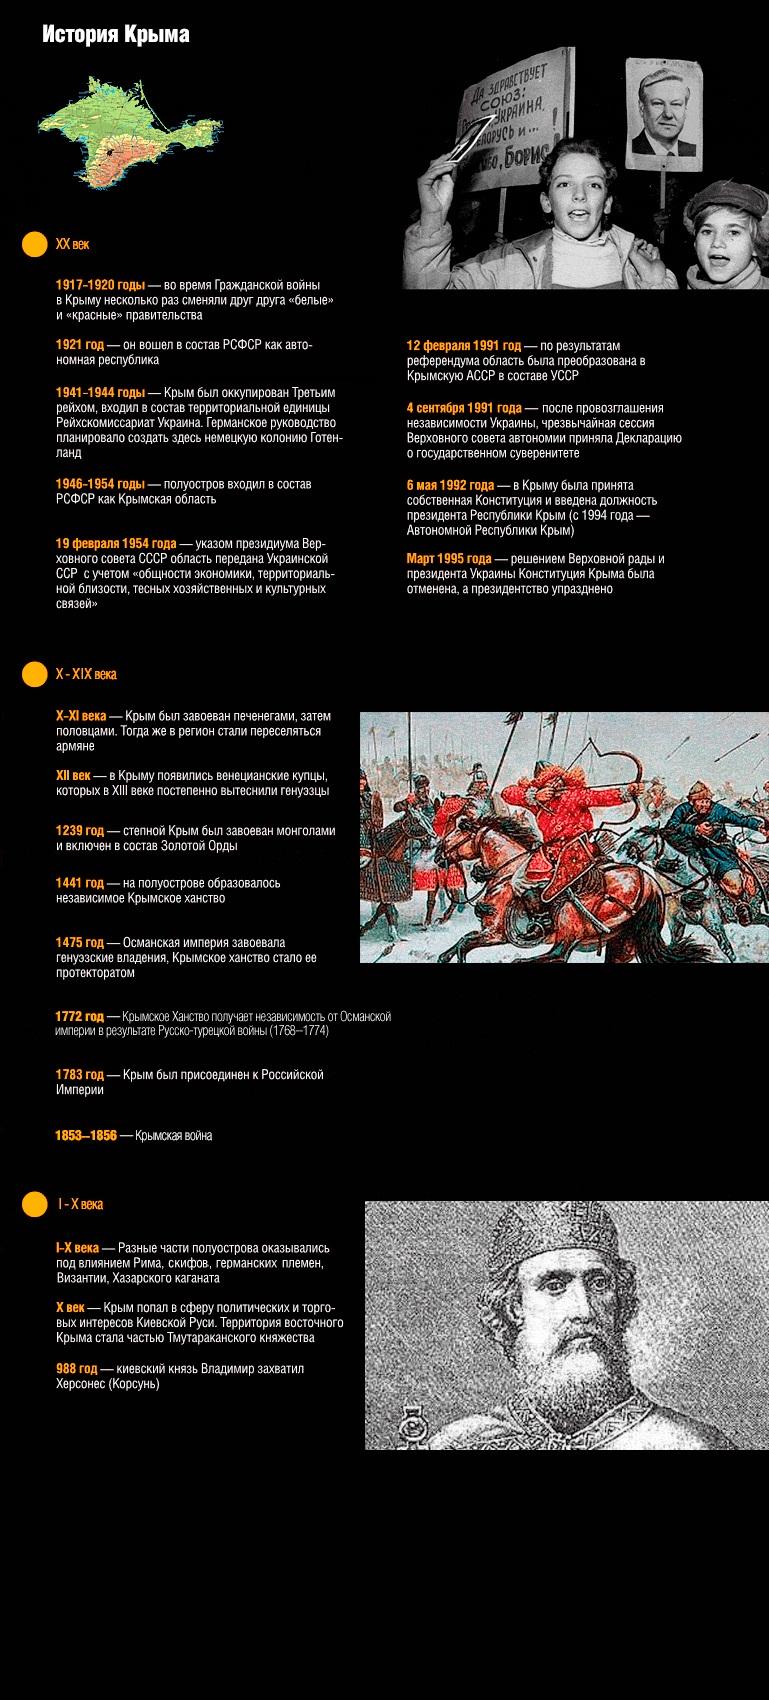 Crimea_map_data_2014_03_17_Kommersant_11_Crimea_history